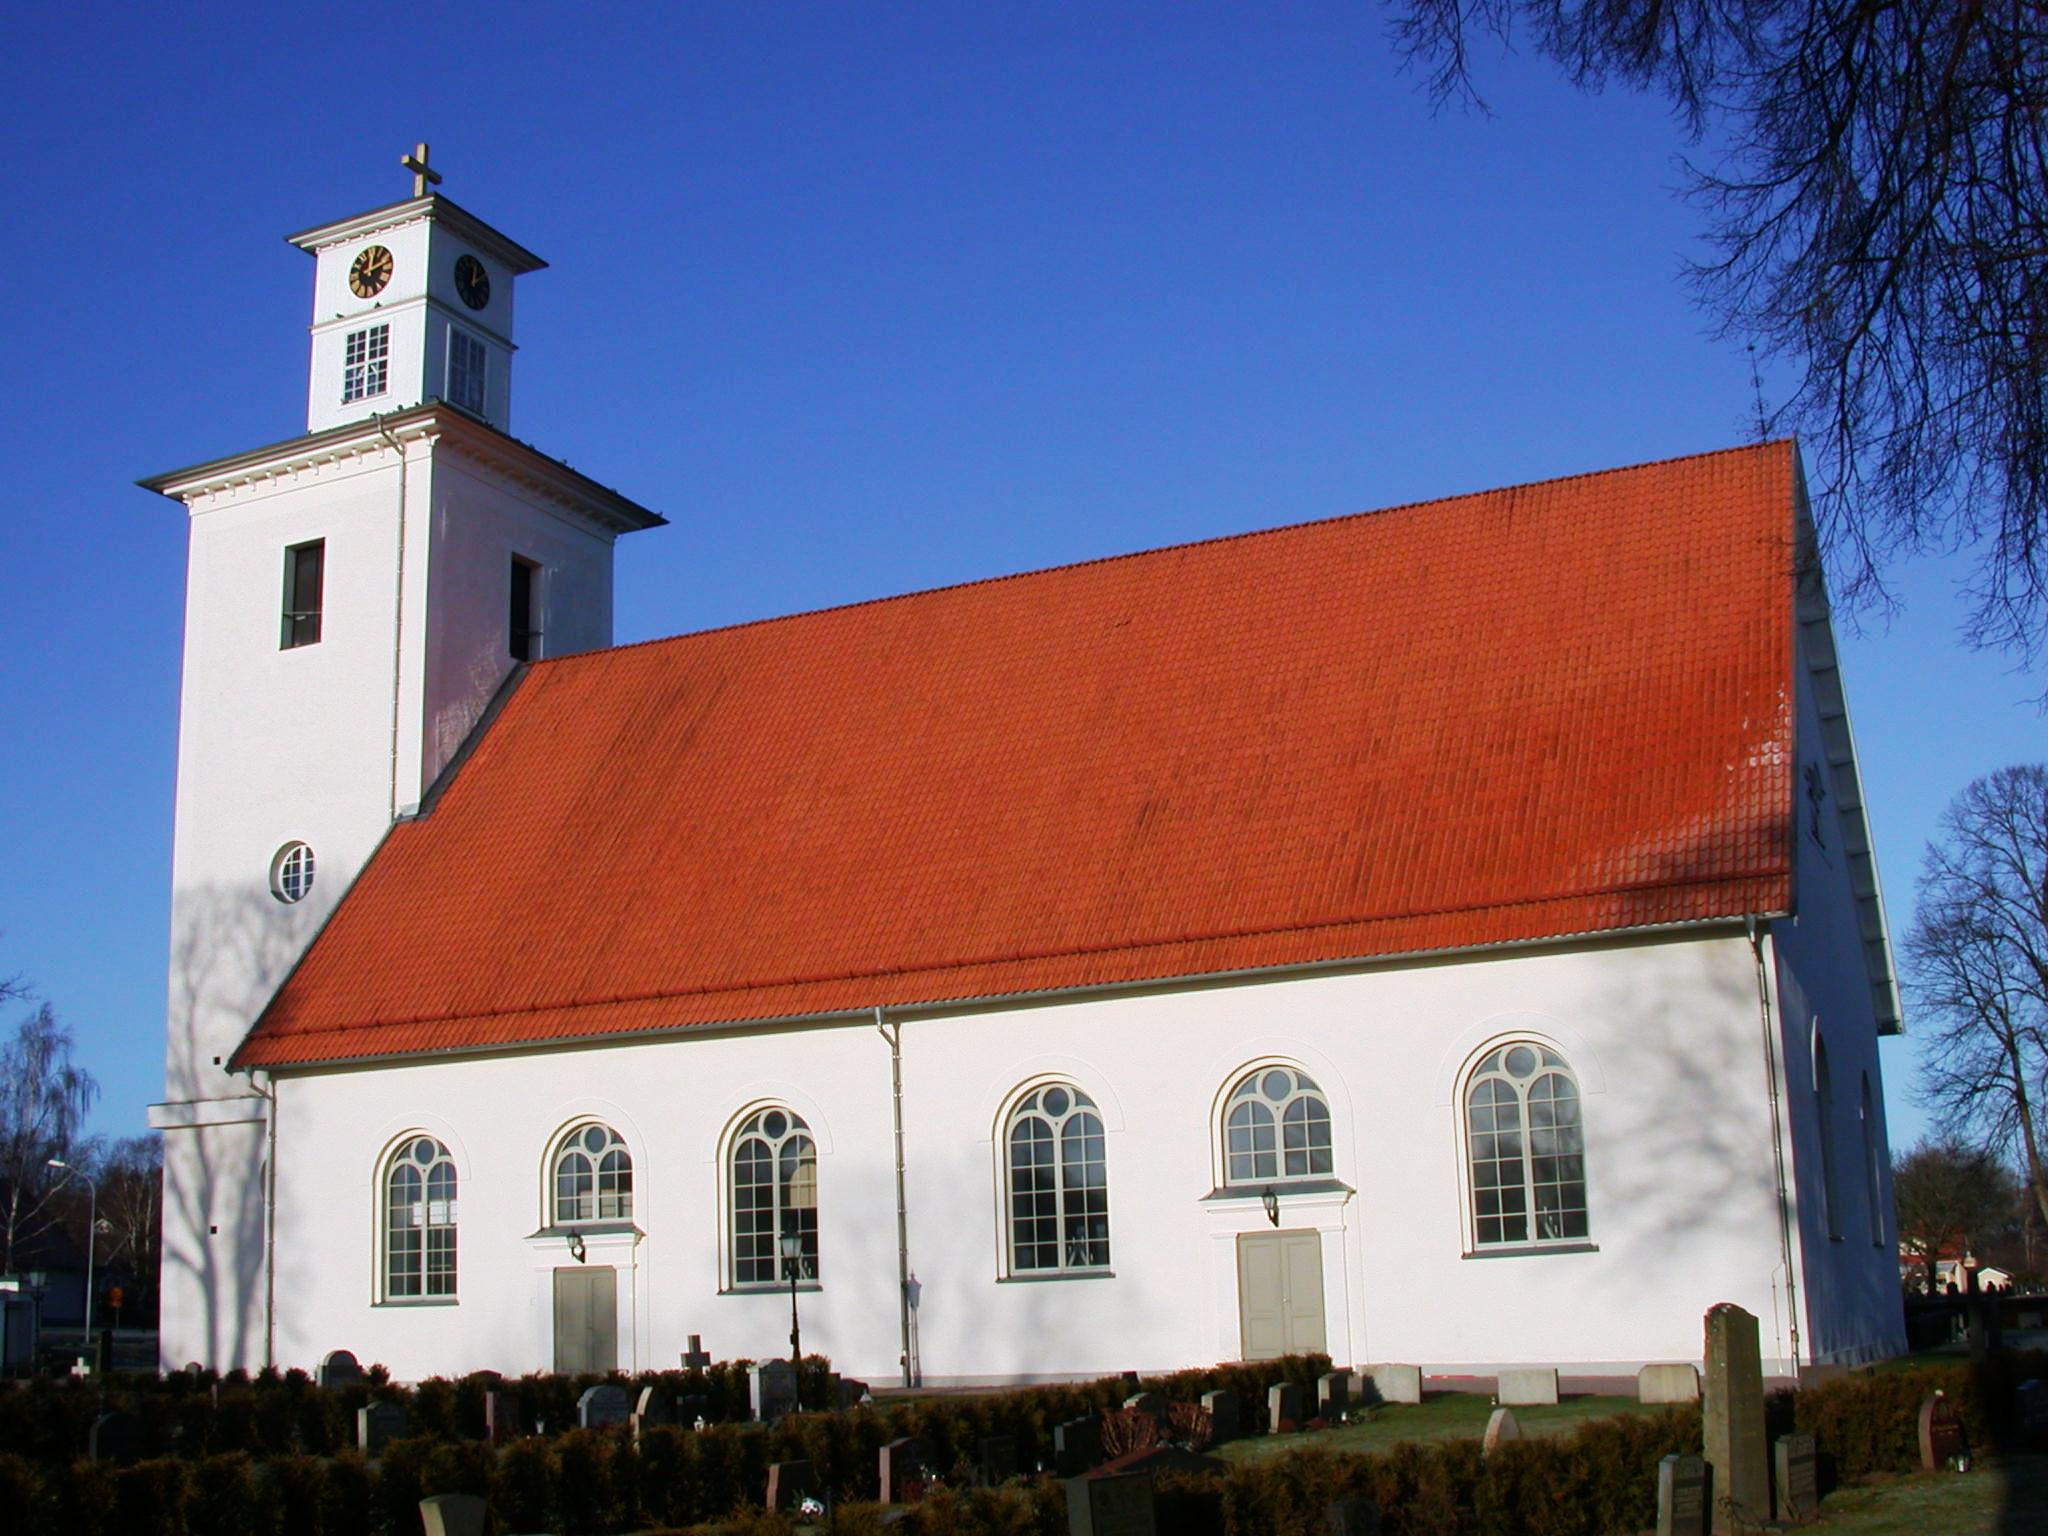 Ryssby Parish, Kronoberg, Sweden Genealogy - FamilySearch